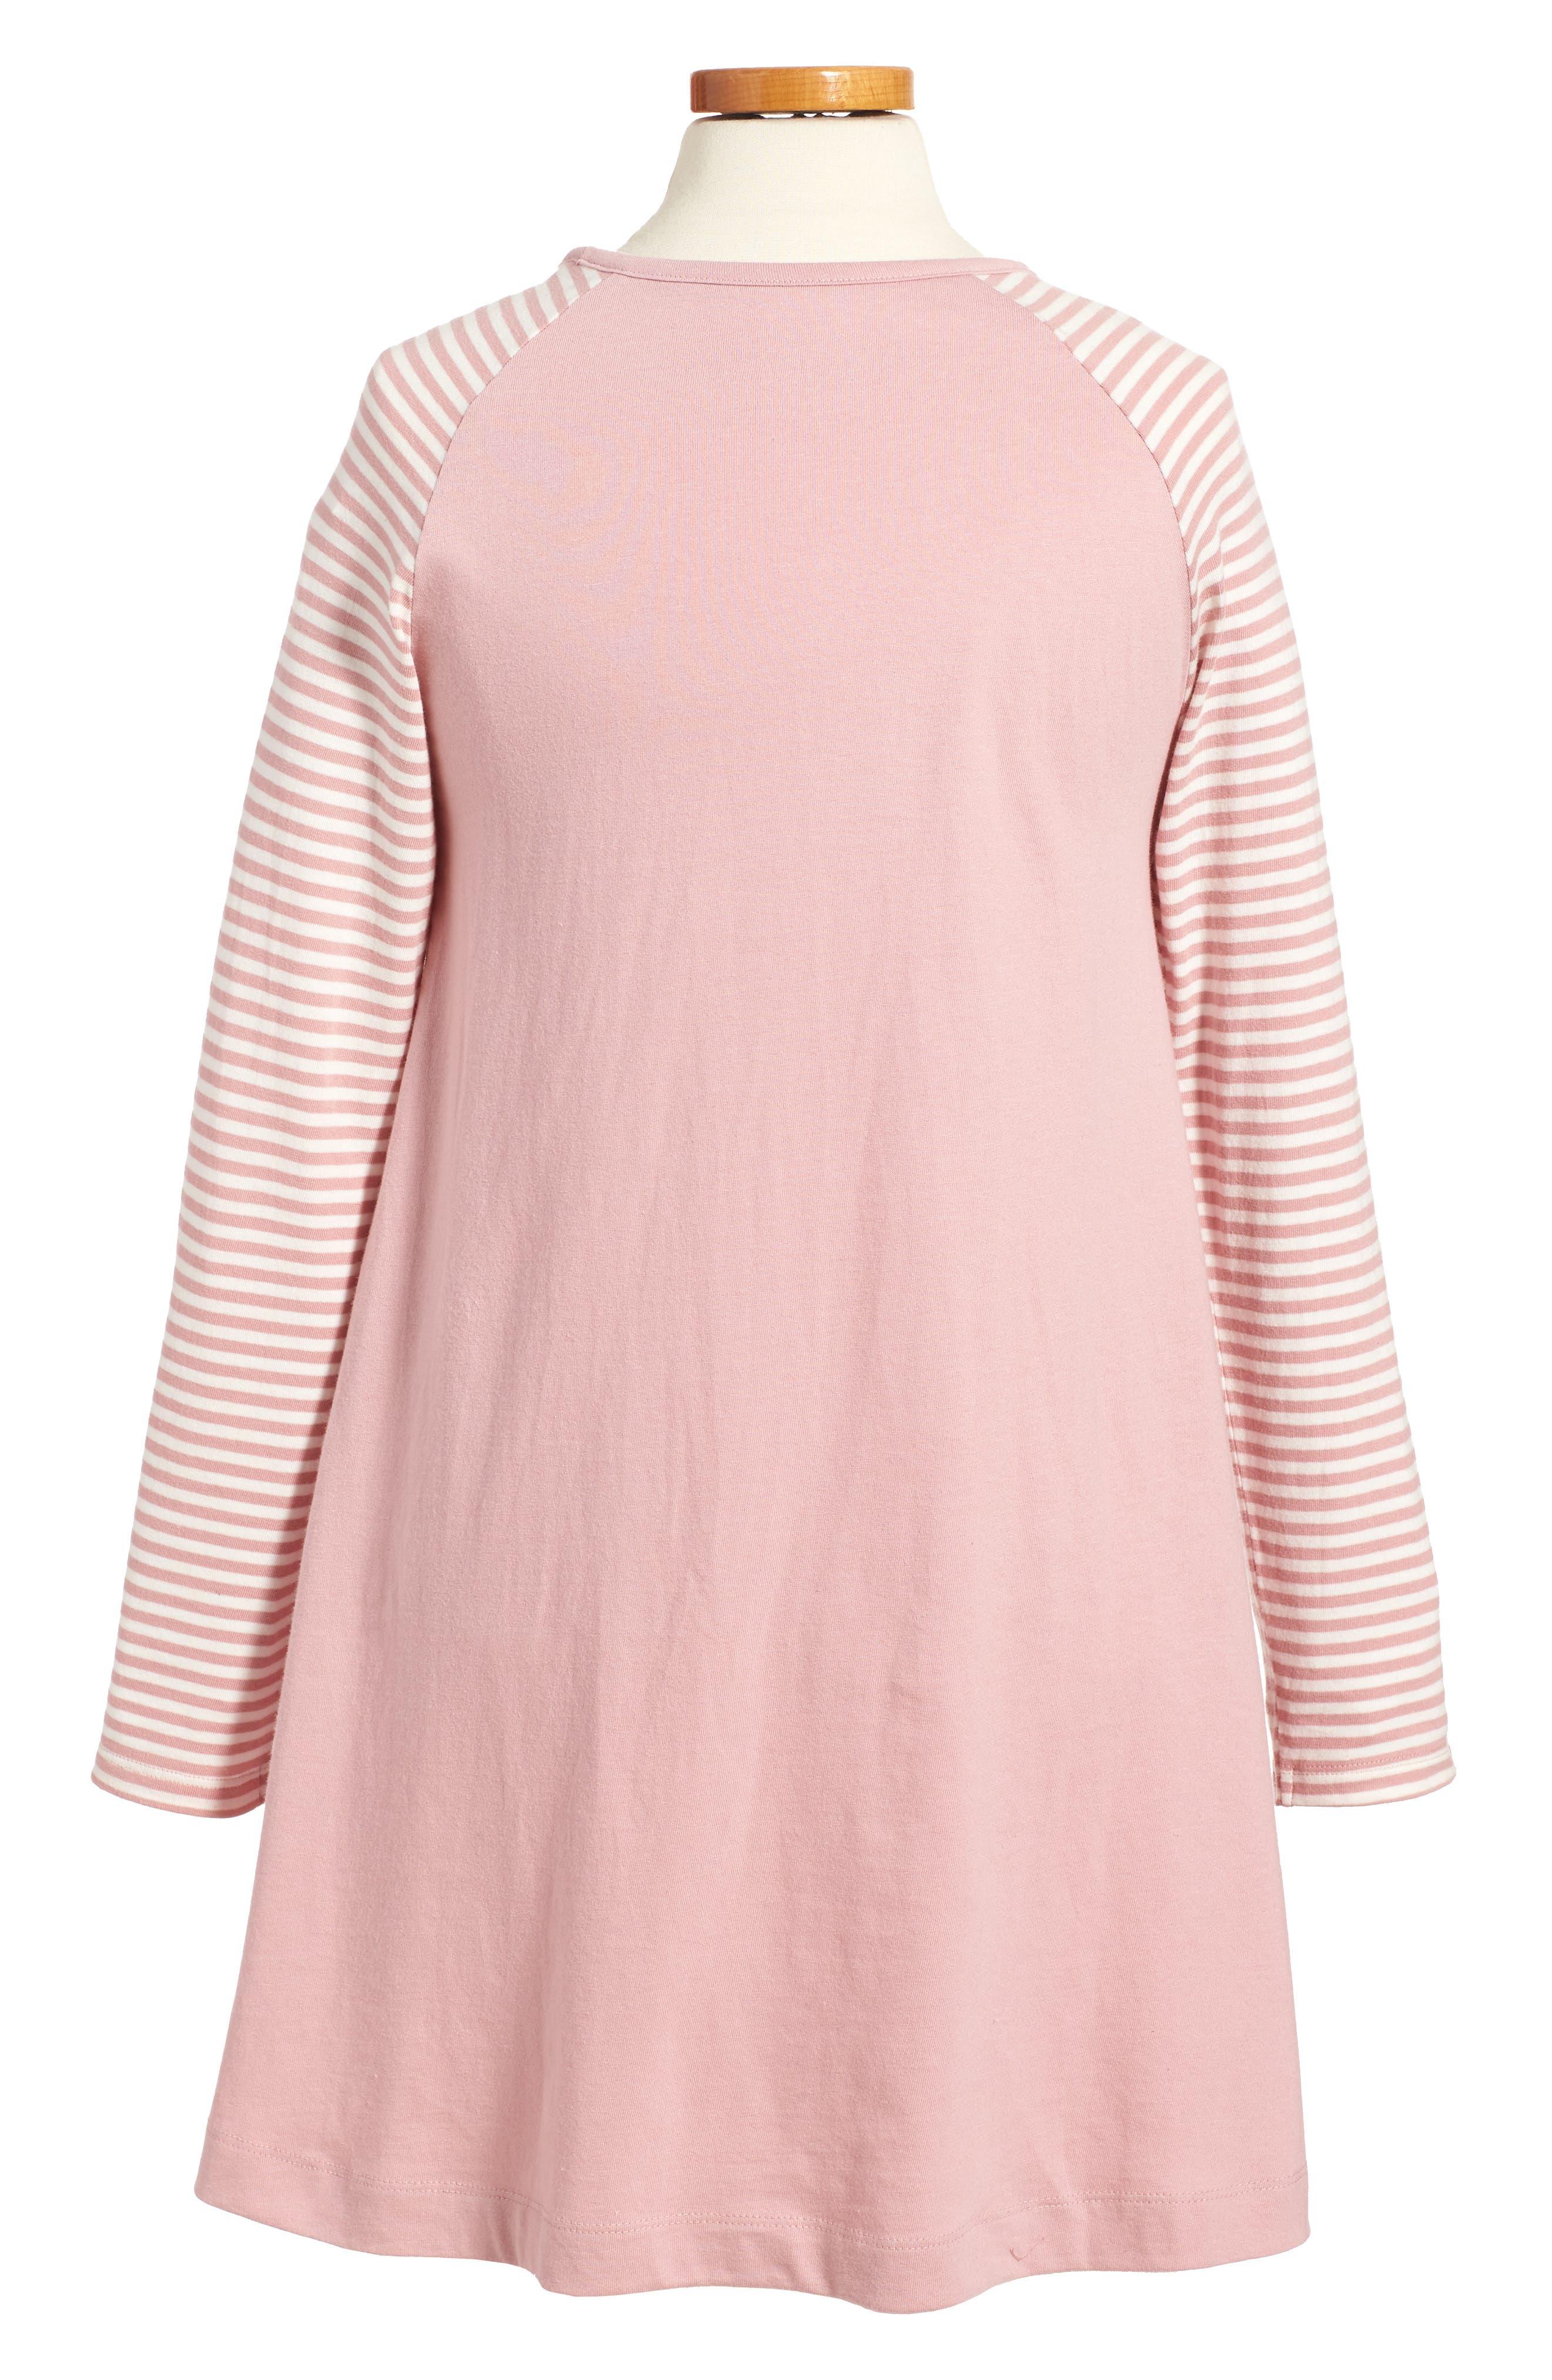 Big Appliqué Jersey Dress,                             Alternate thumbnail 2, color,                             Vintage Pink Robin